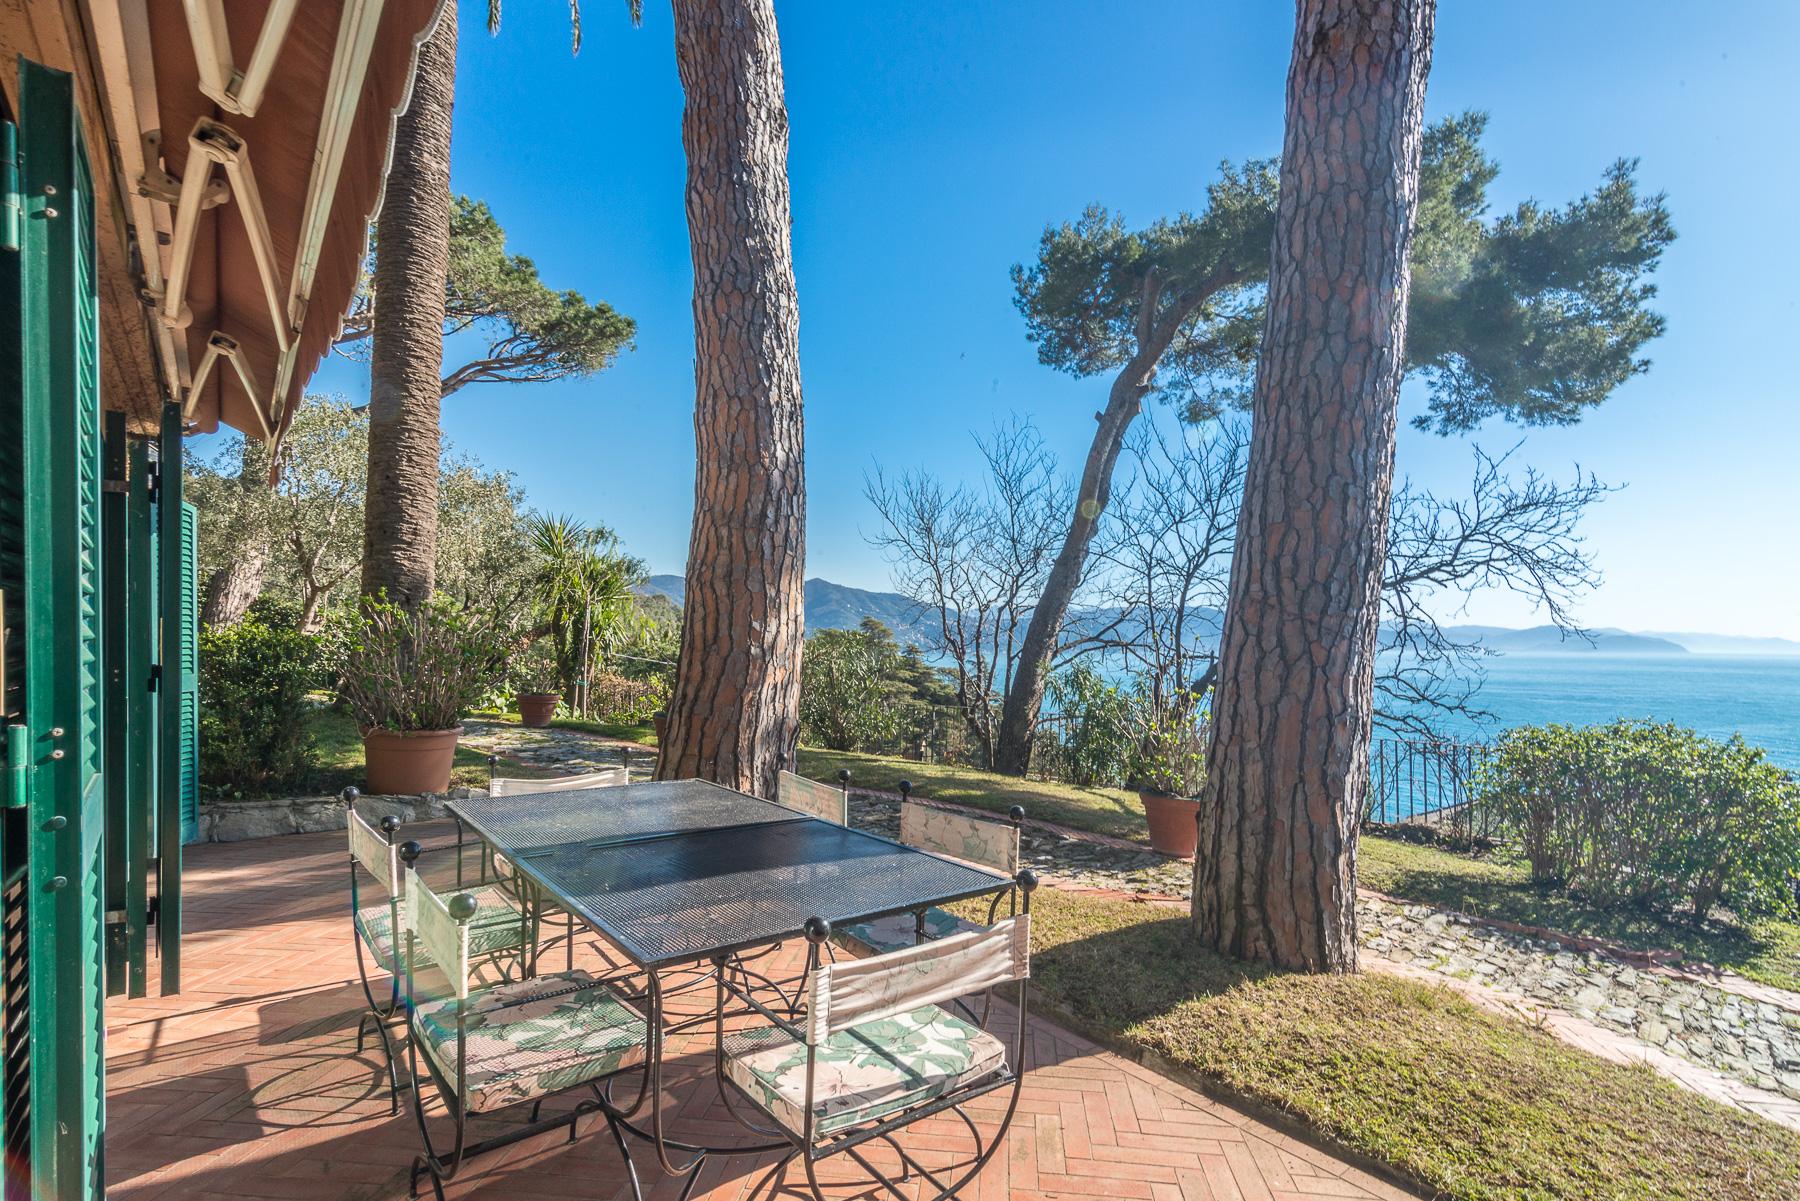 Villa in Vendita a Santa Margherita Ligure: 5 locali, 440 mq - Foto 24